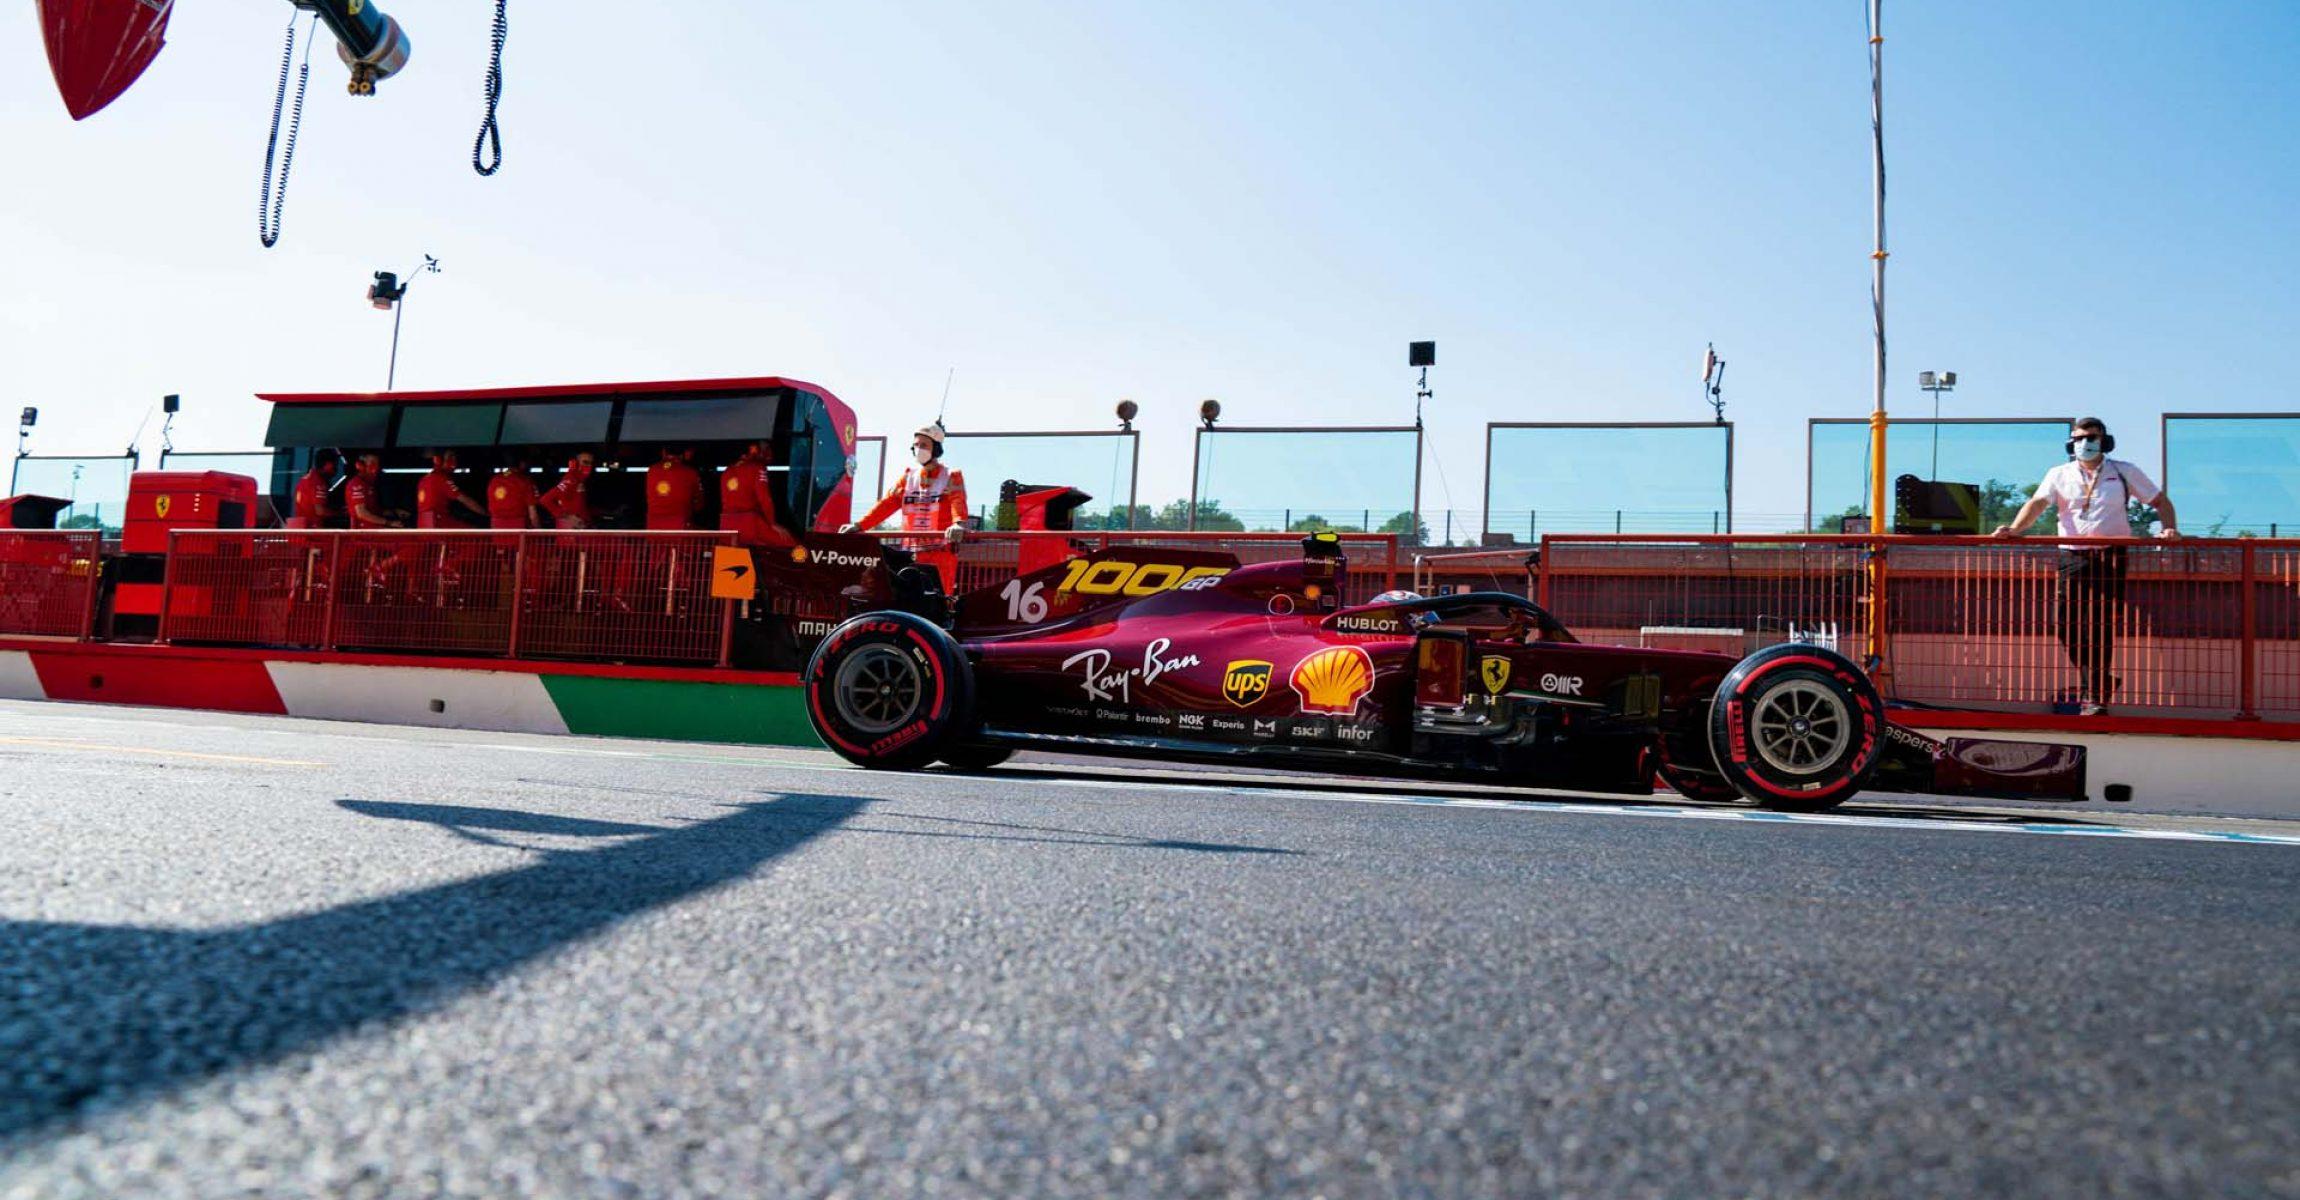 GP TOSCANA FERRARI 1000 F1/2020 -  SABATO 12/09/2020   Charles Leclerc credit: @Scuderia Ferrari Press Office